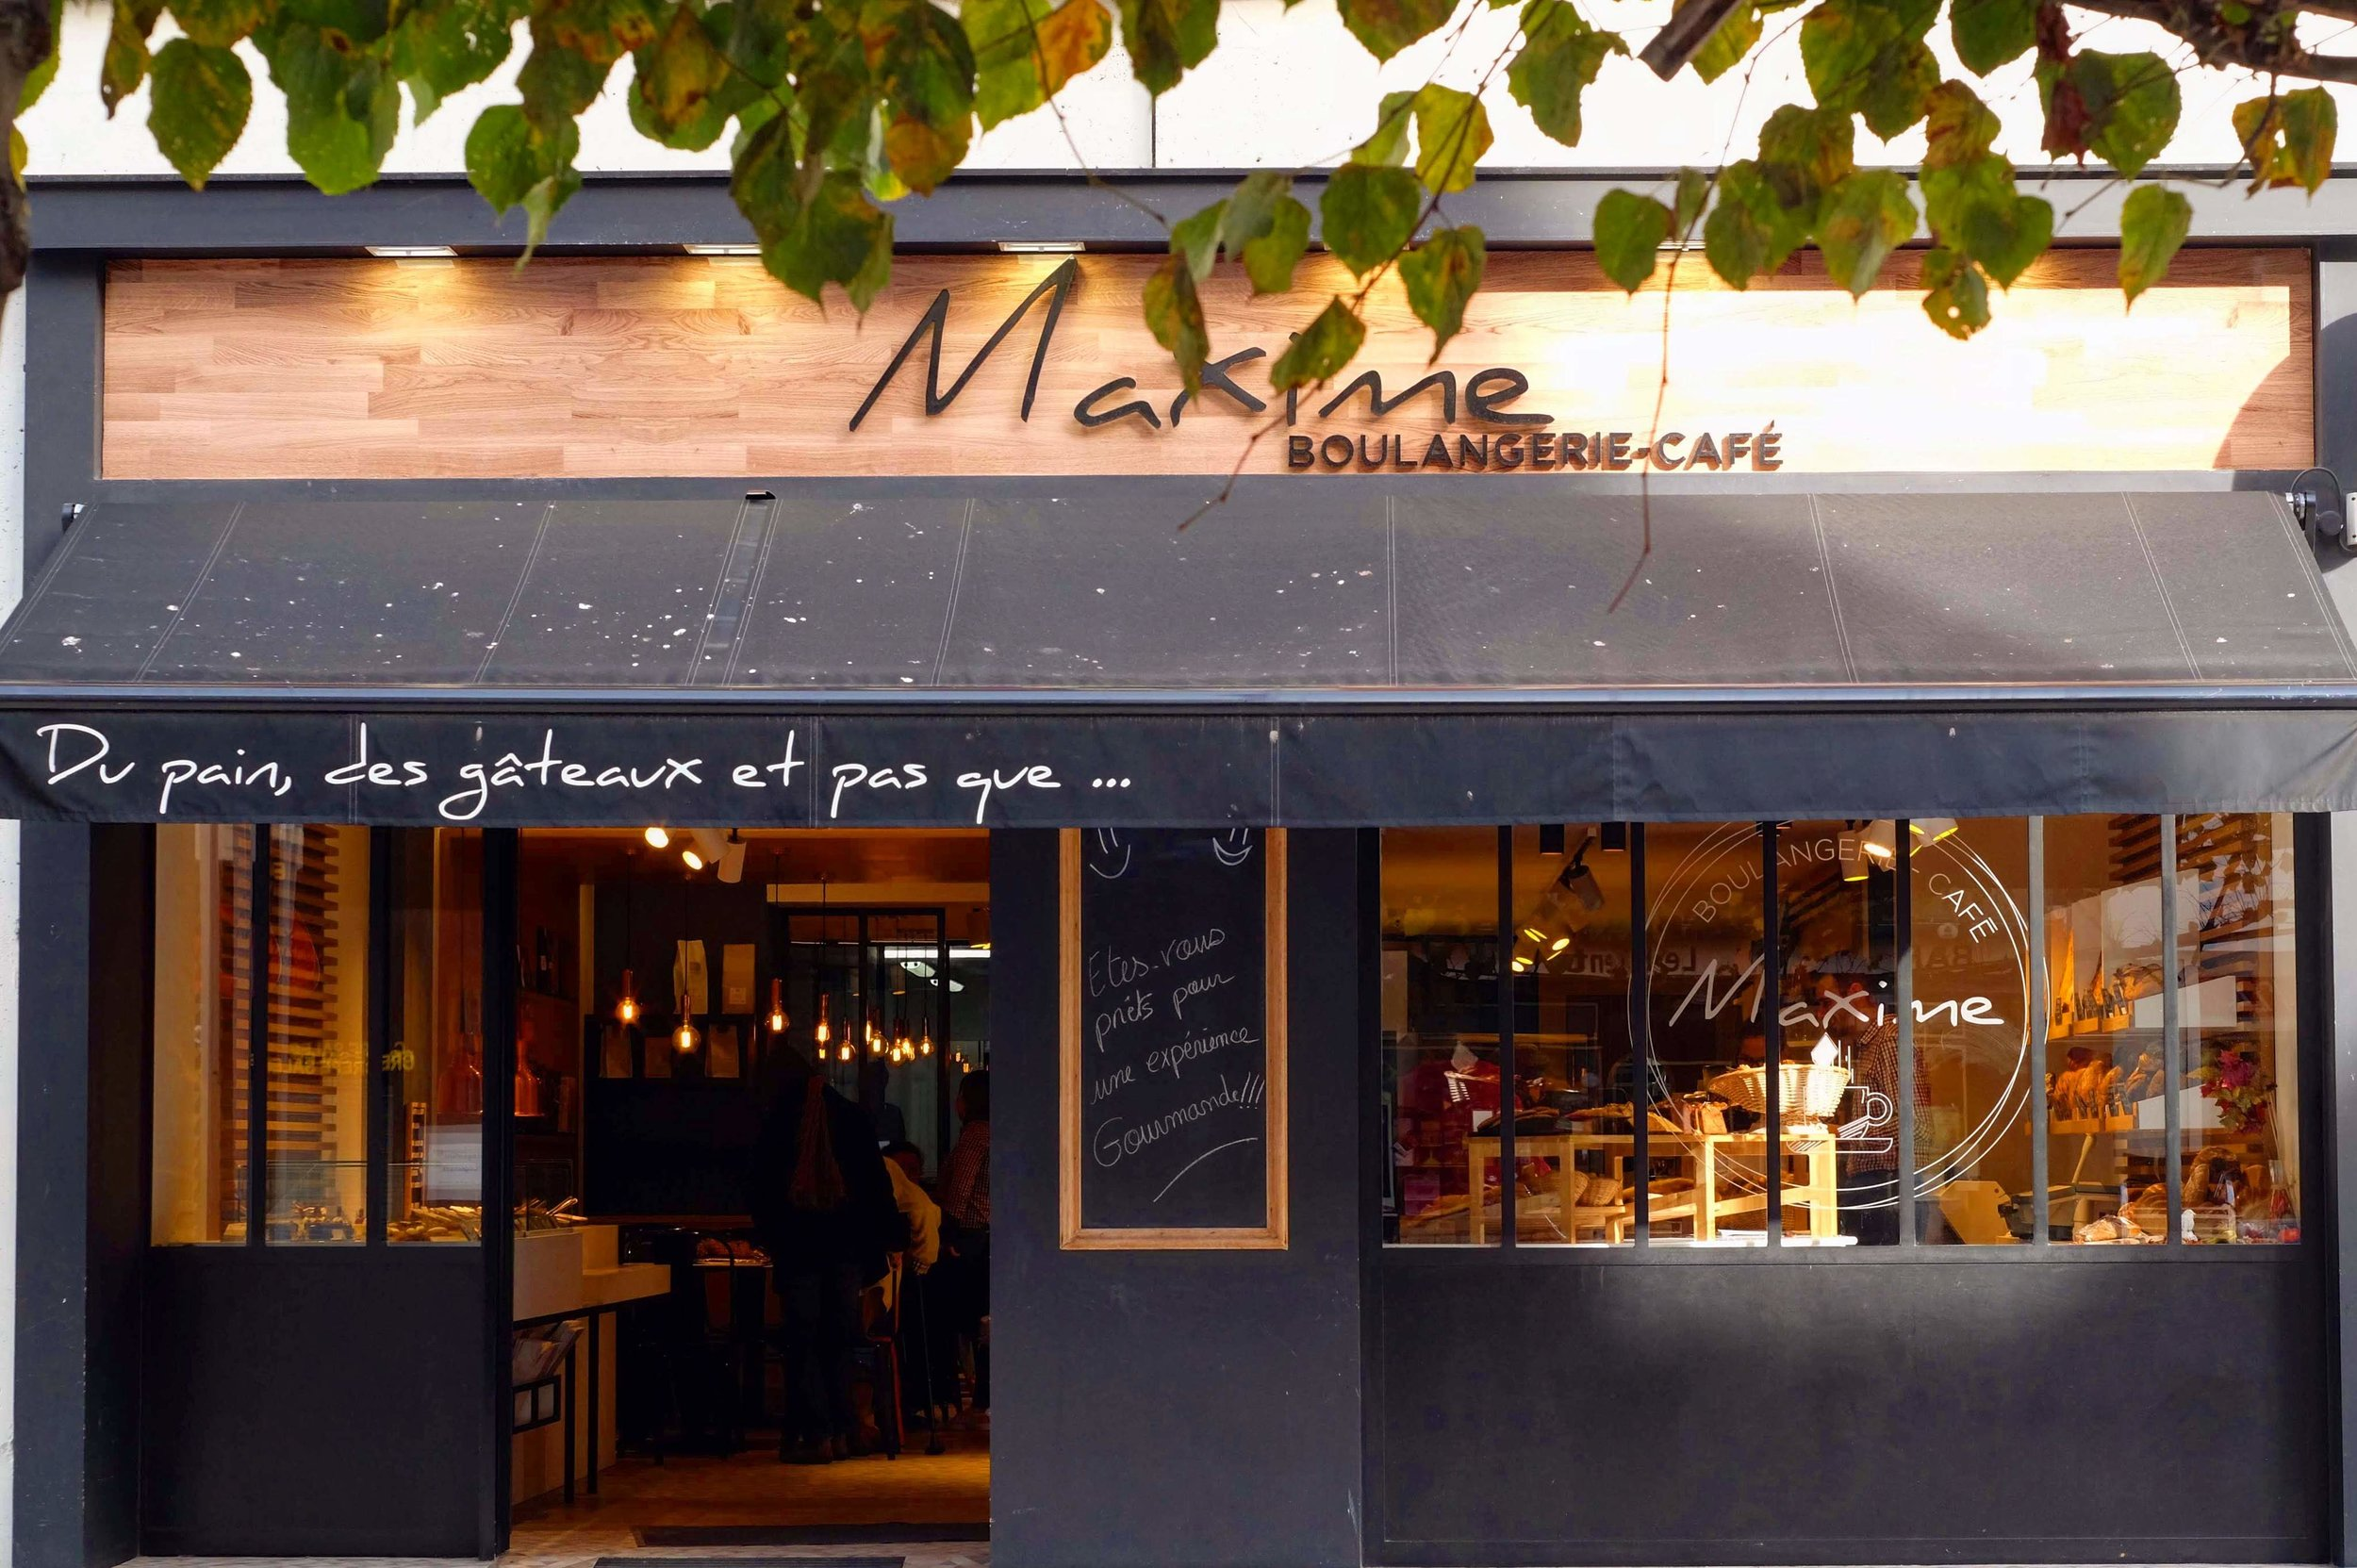 Maxime Boulangerie Café in Amiens, France